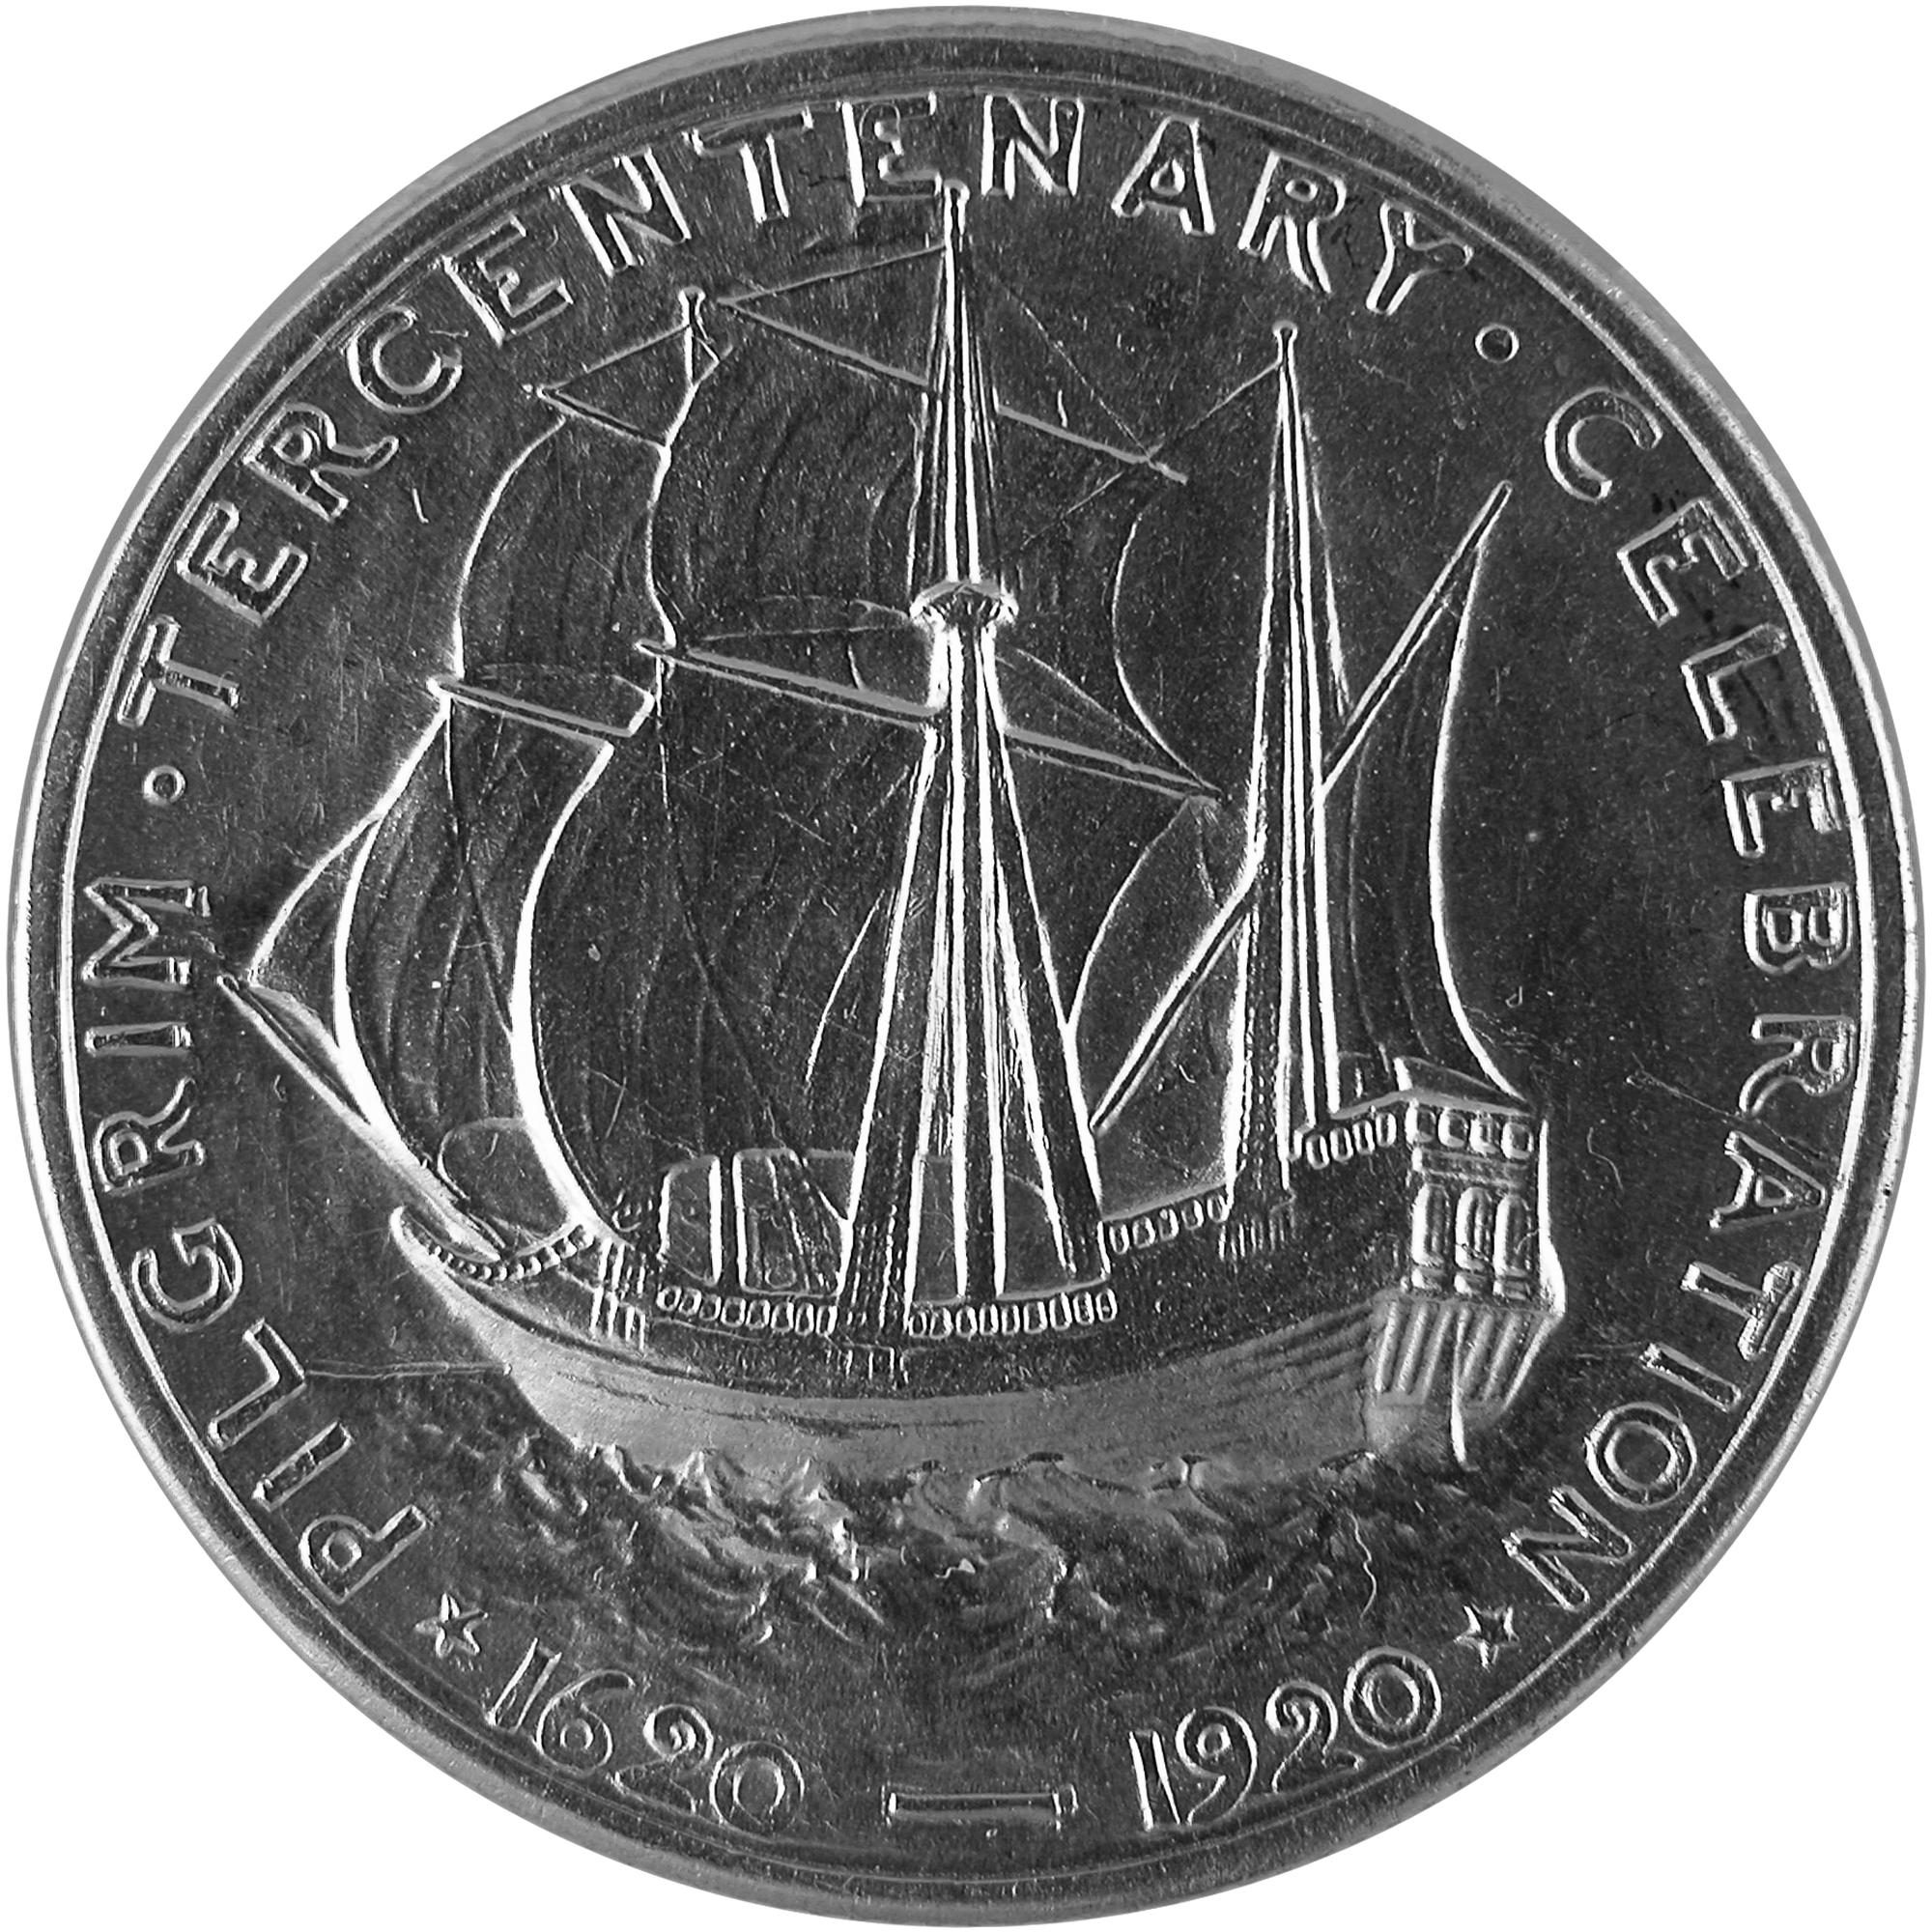 1920 Pilgrim Tercentenary Commemorative Silver Half Dollar Coin Reverse